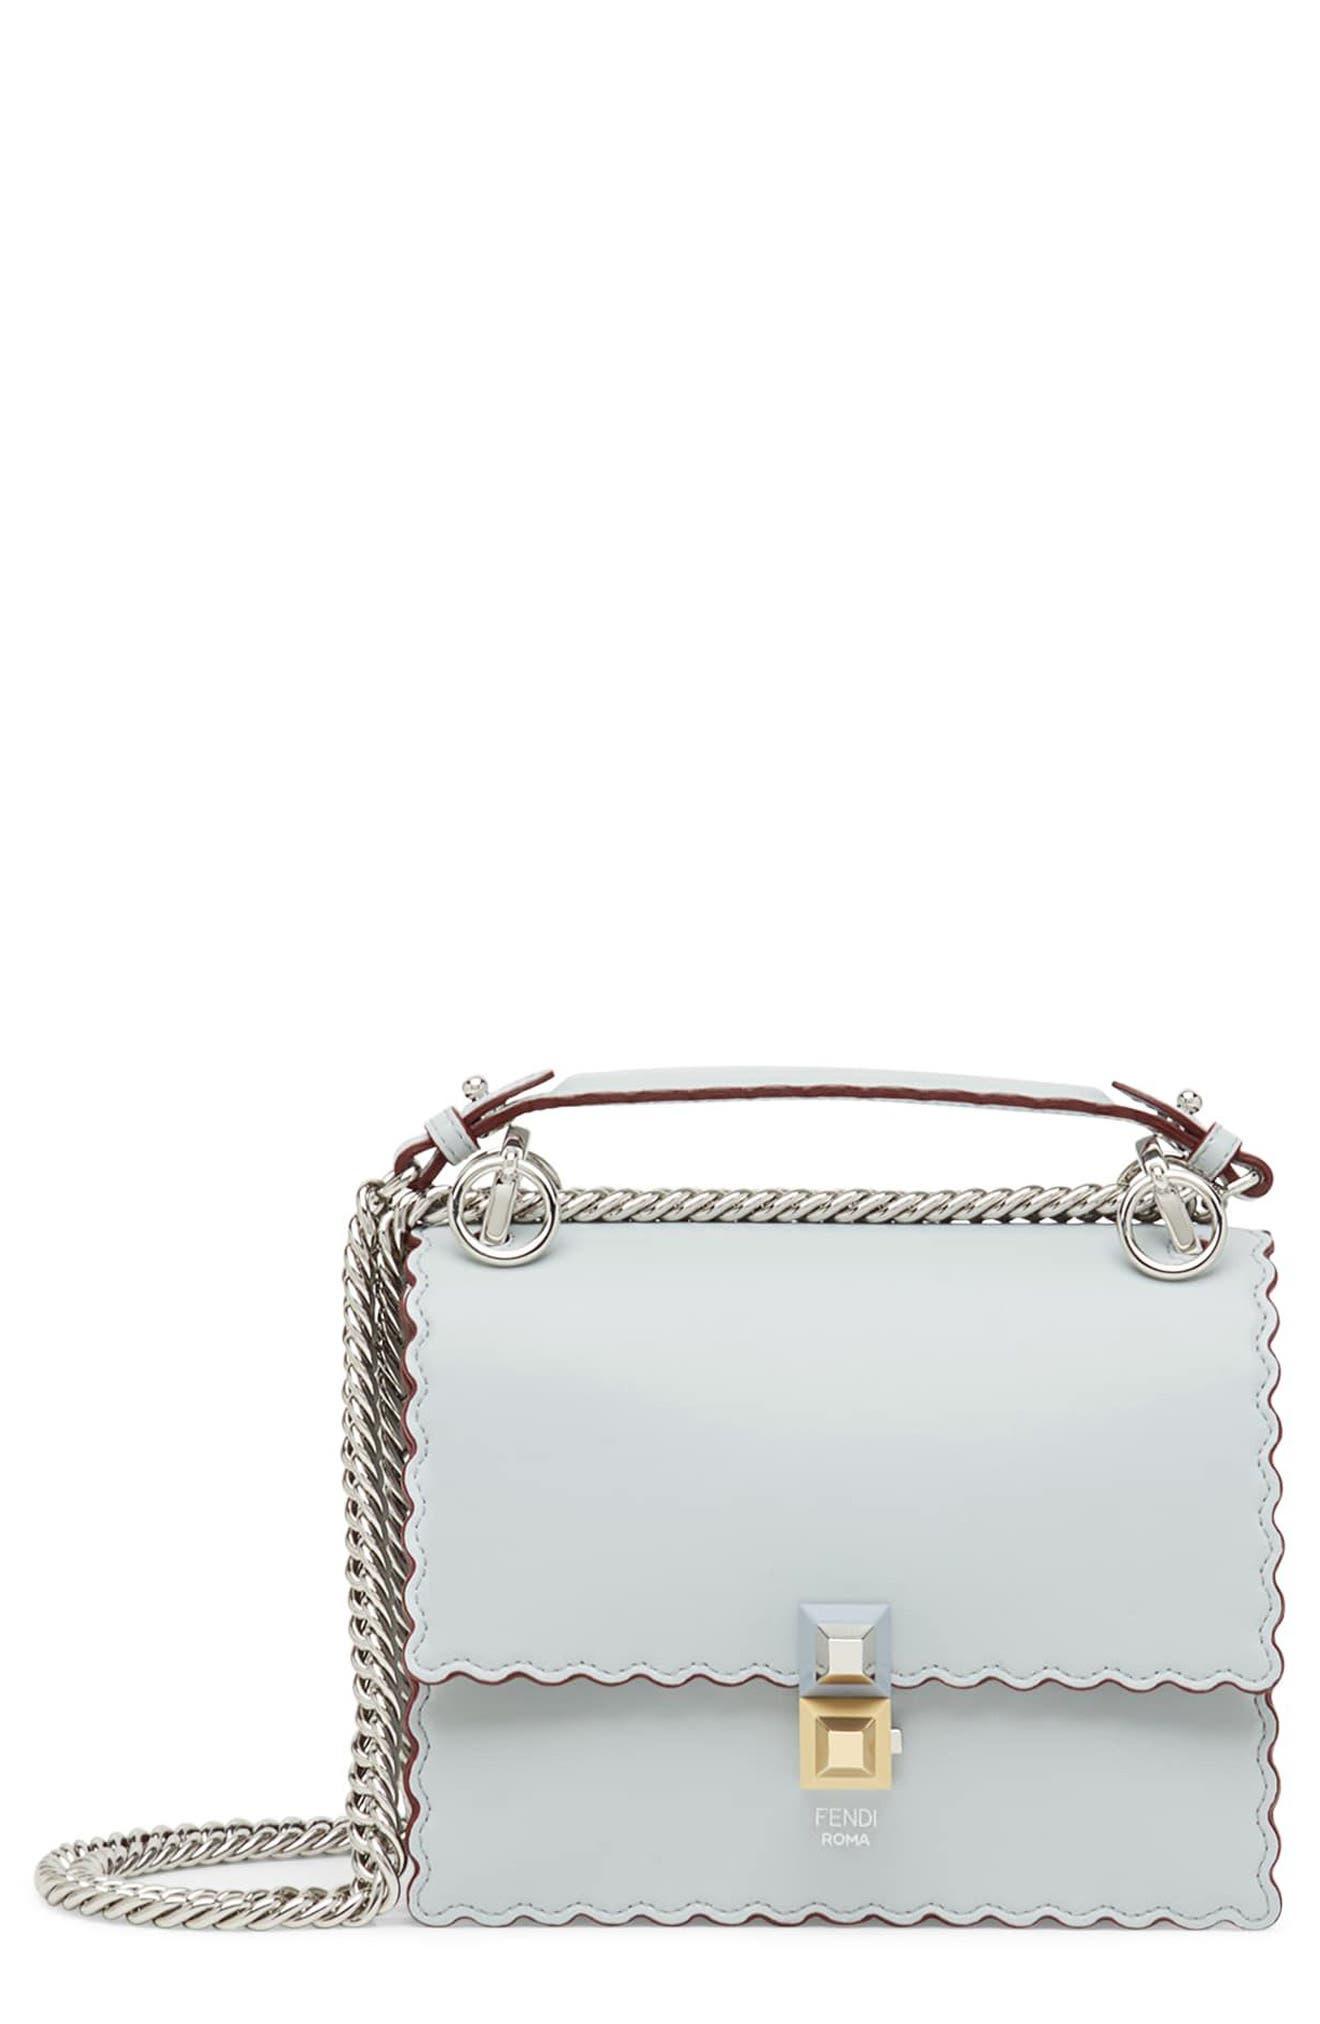 Mini Kan I Scalloped Leather Shoulder Bag,                             Main thumbnail 1, color,                             Grigio Perla/ Palladio